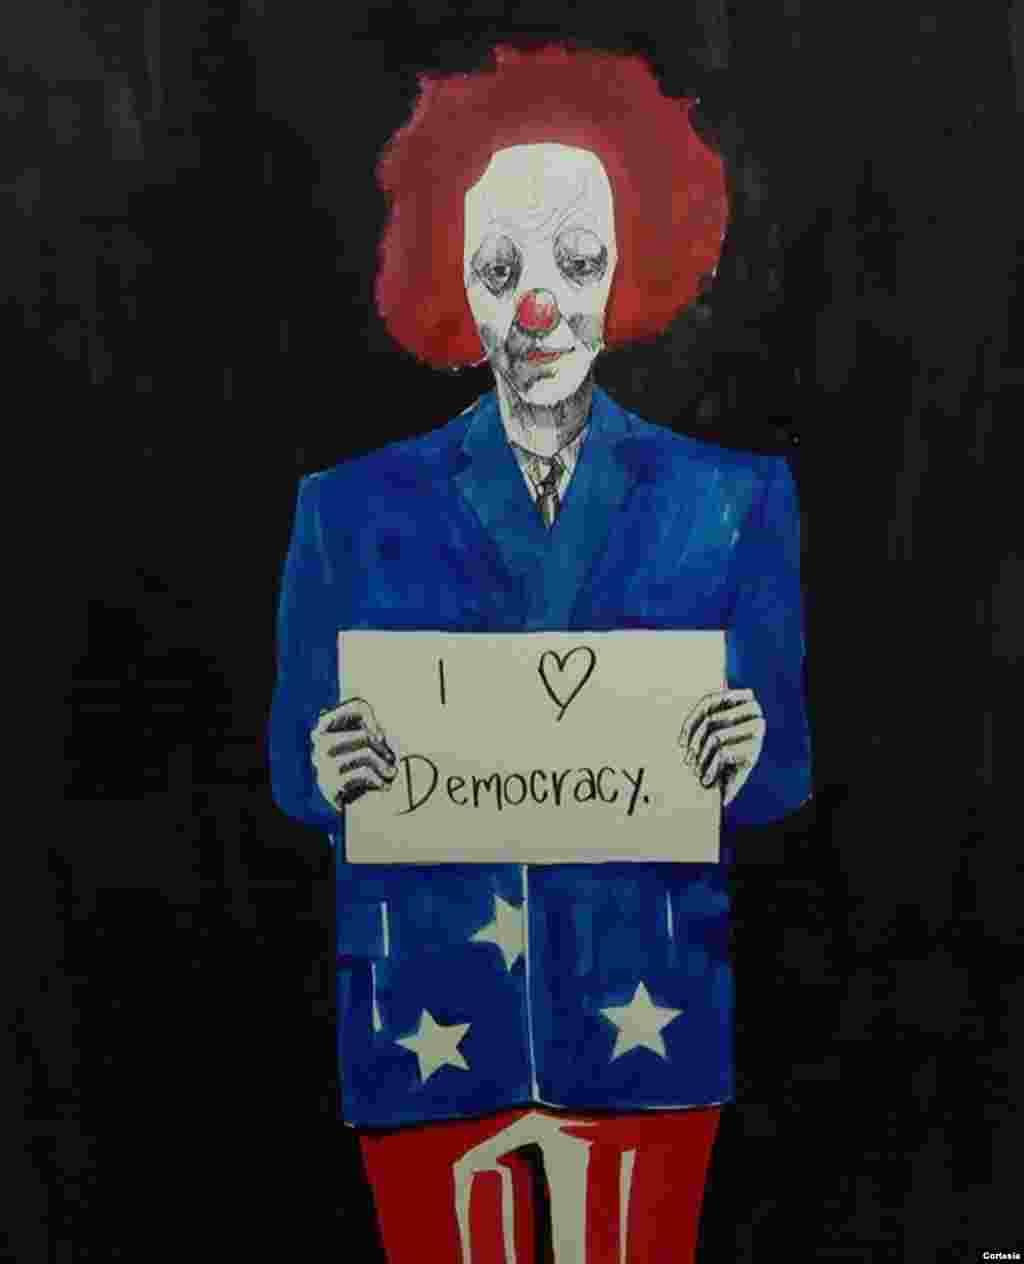 Obra de arte tributo a la democracia en Honduras.